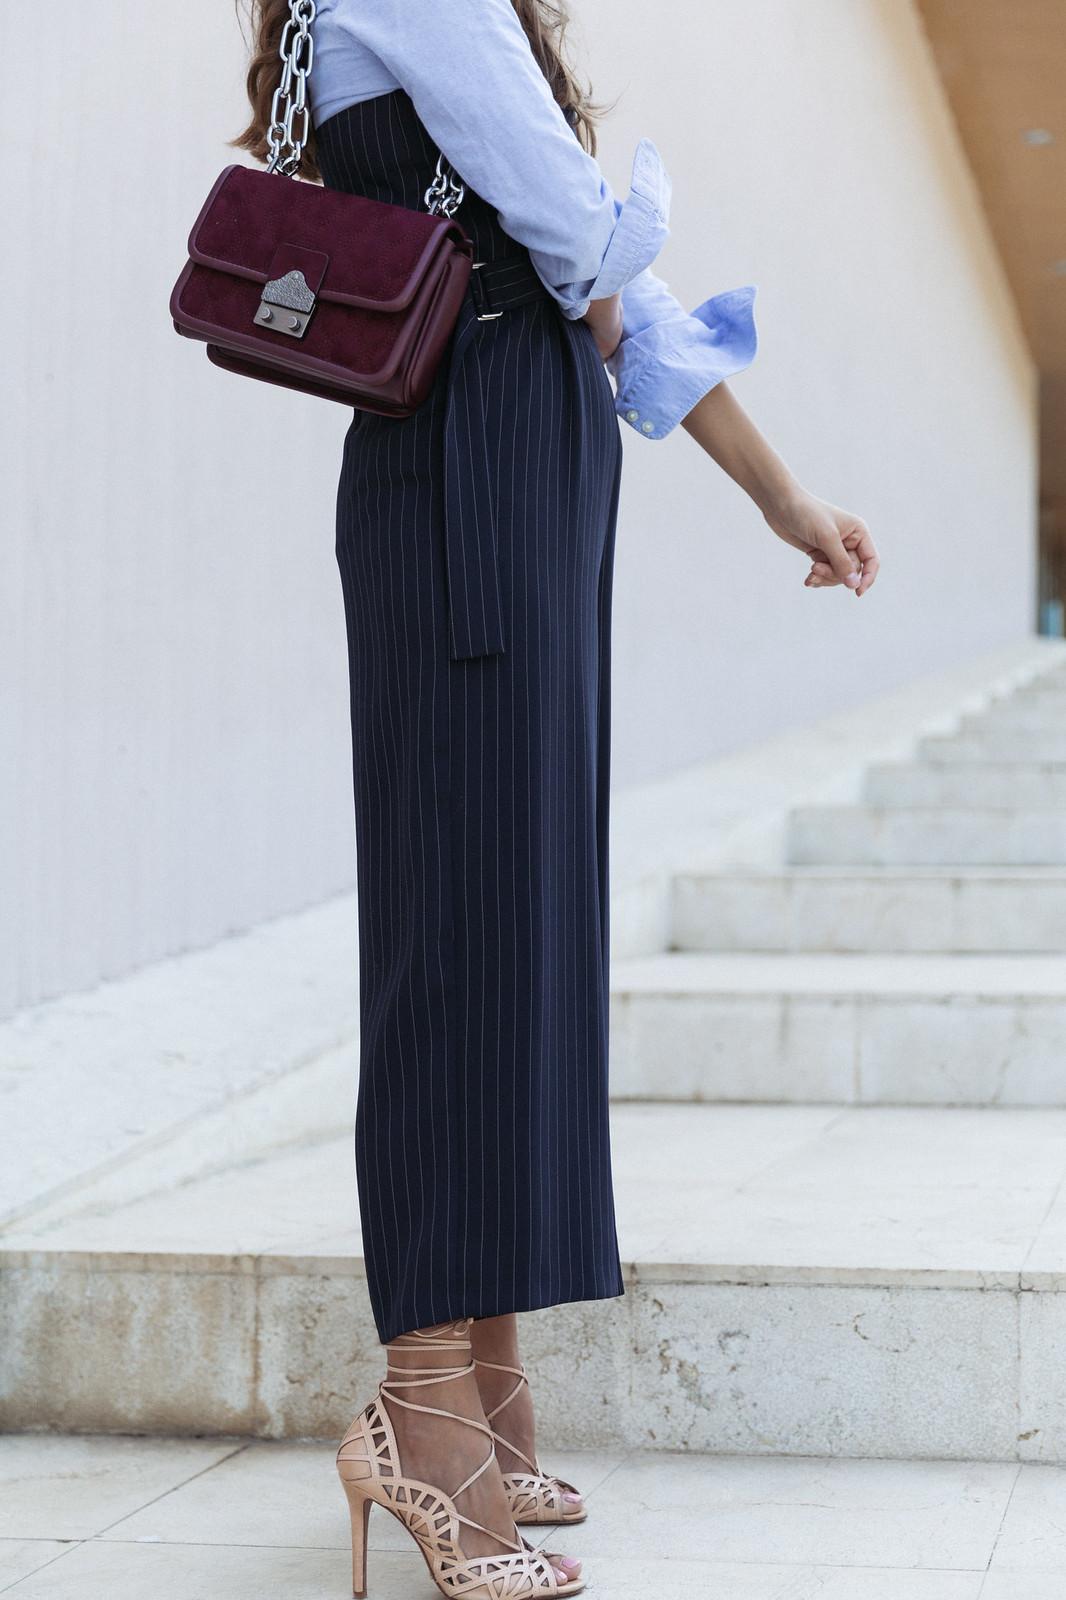 Jessie Chanes Seams for a desire - Pinstripped suit topshop heeled sandals schutz parfois bag  -4